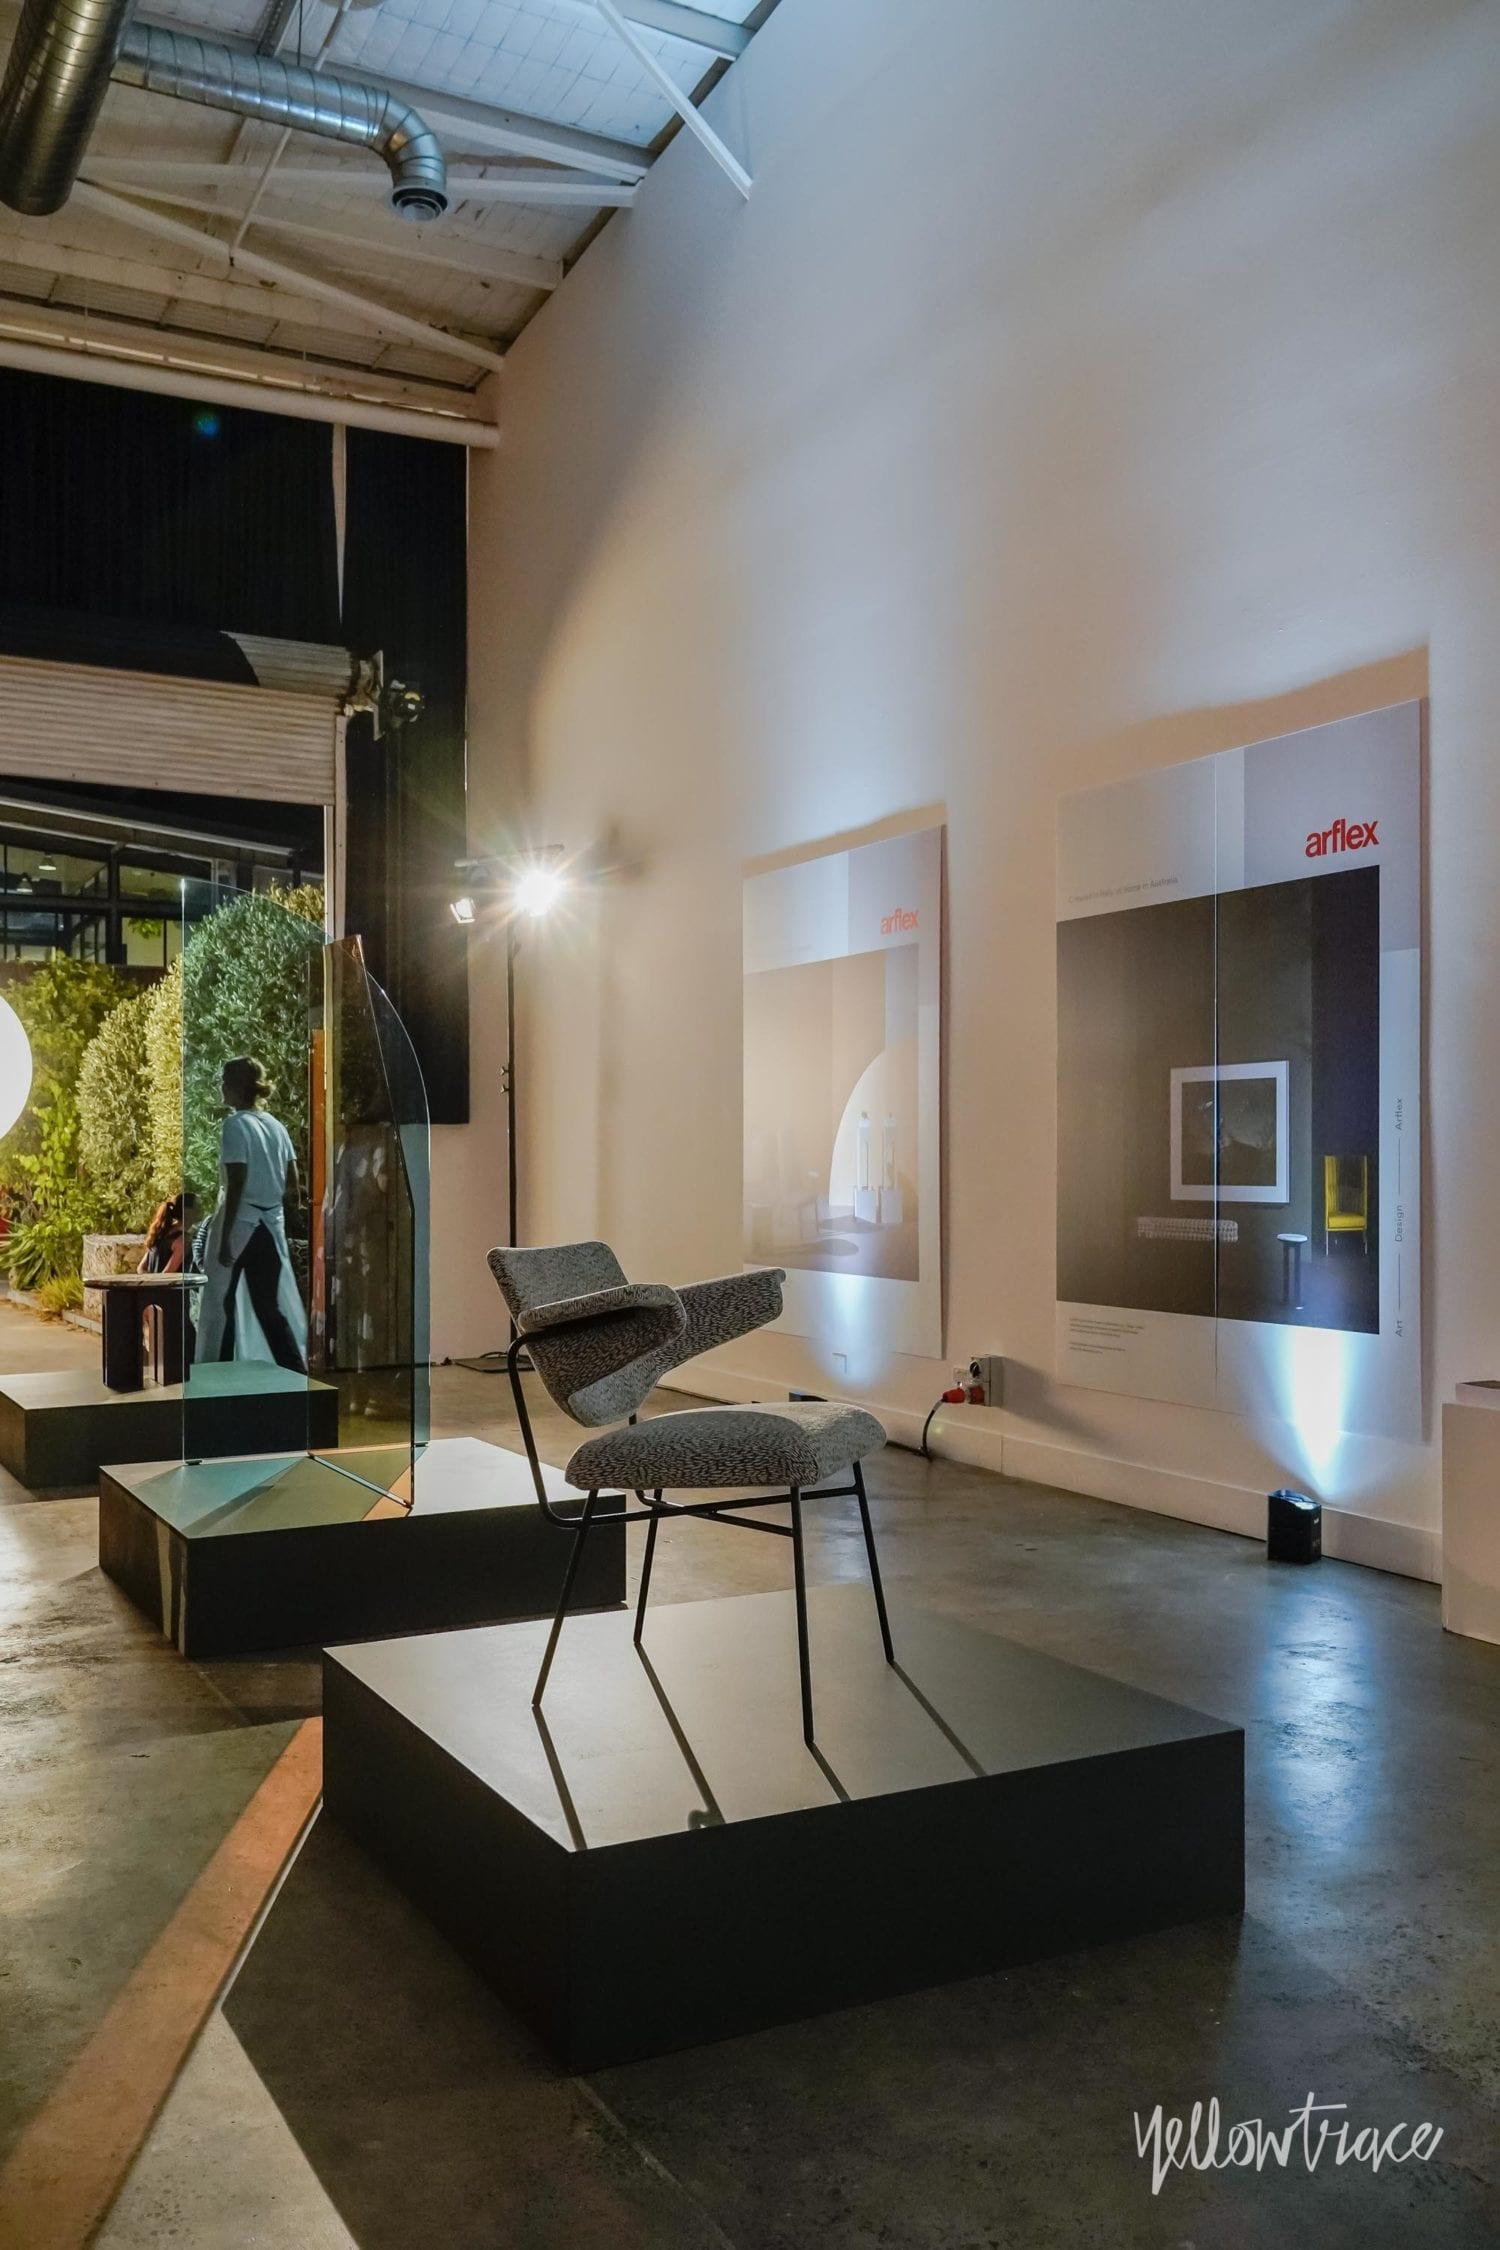 Yellowtrace x Arflex Art – Design – Arflex Campaign Launch in Sydney. Photo by Nick Hughes | Yellowtrace